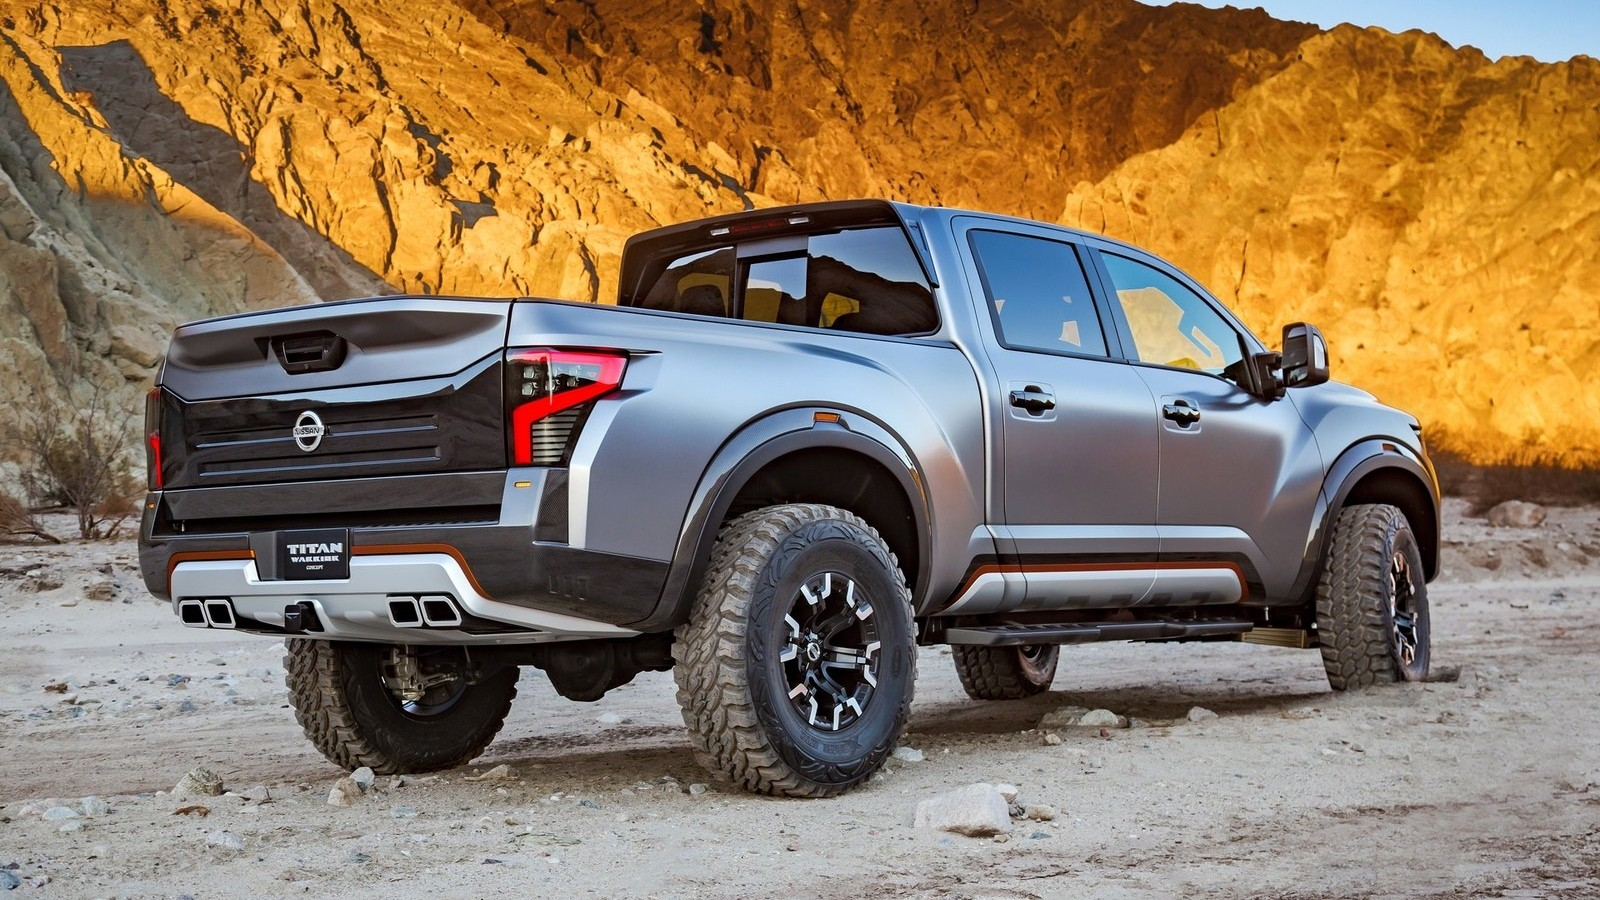 Nissan-Titan_Warrior_Concept-2016-1600-0b